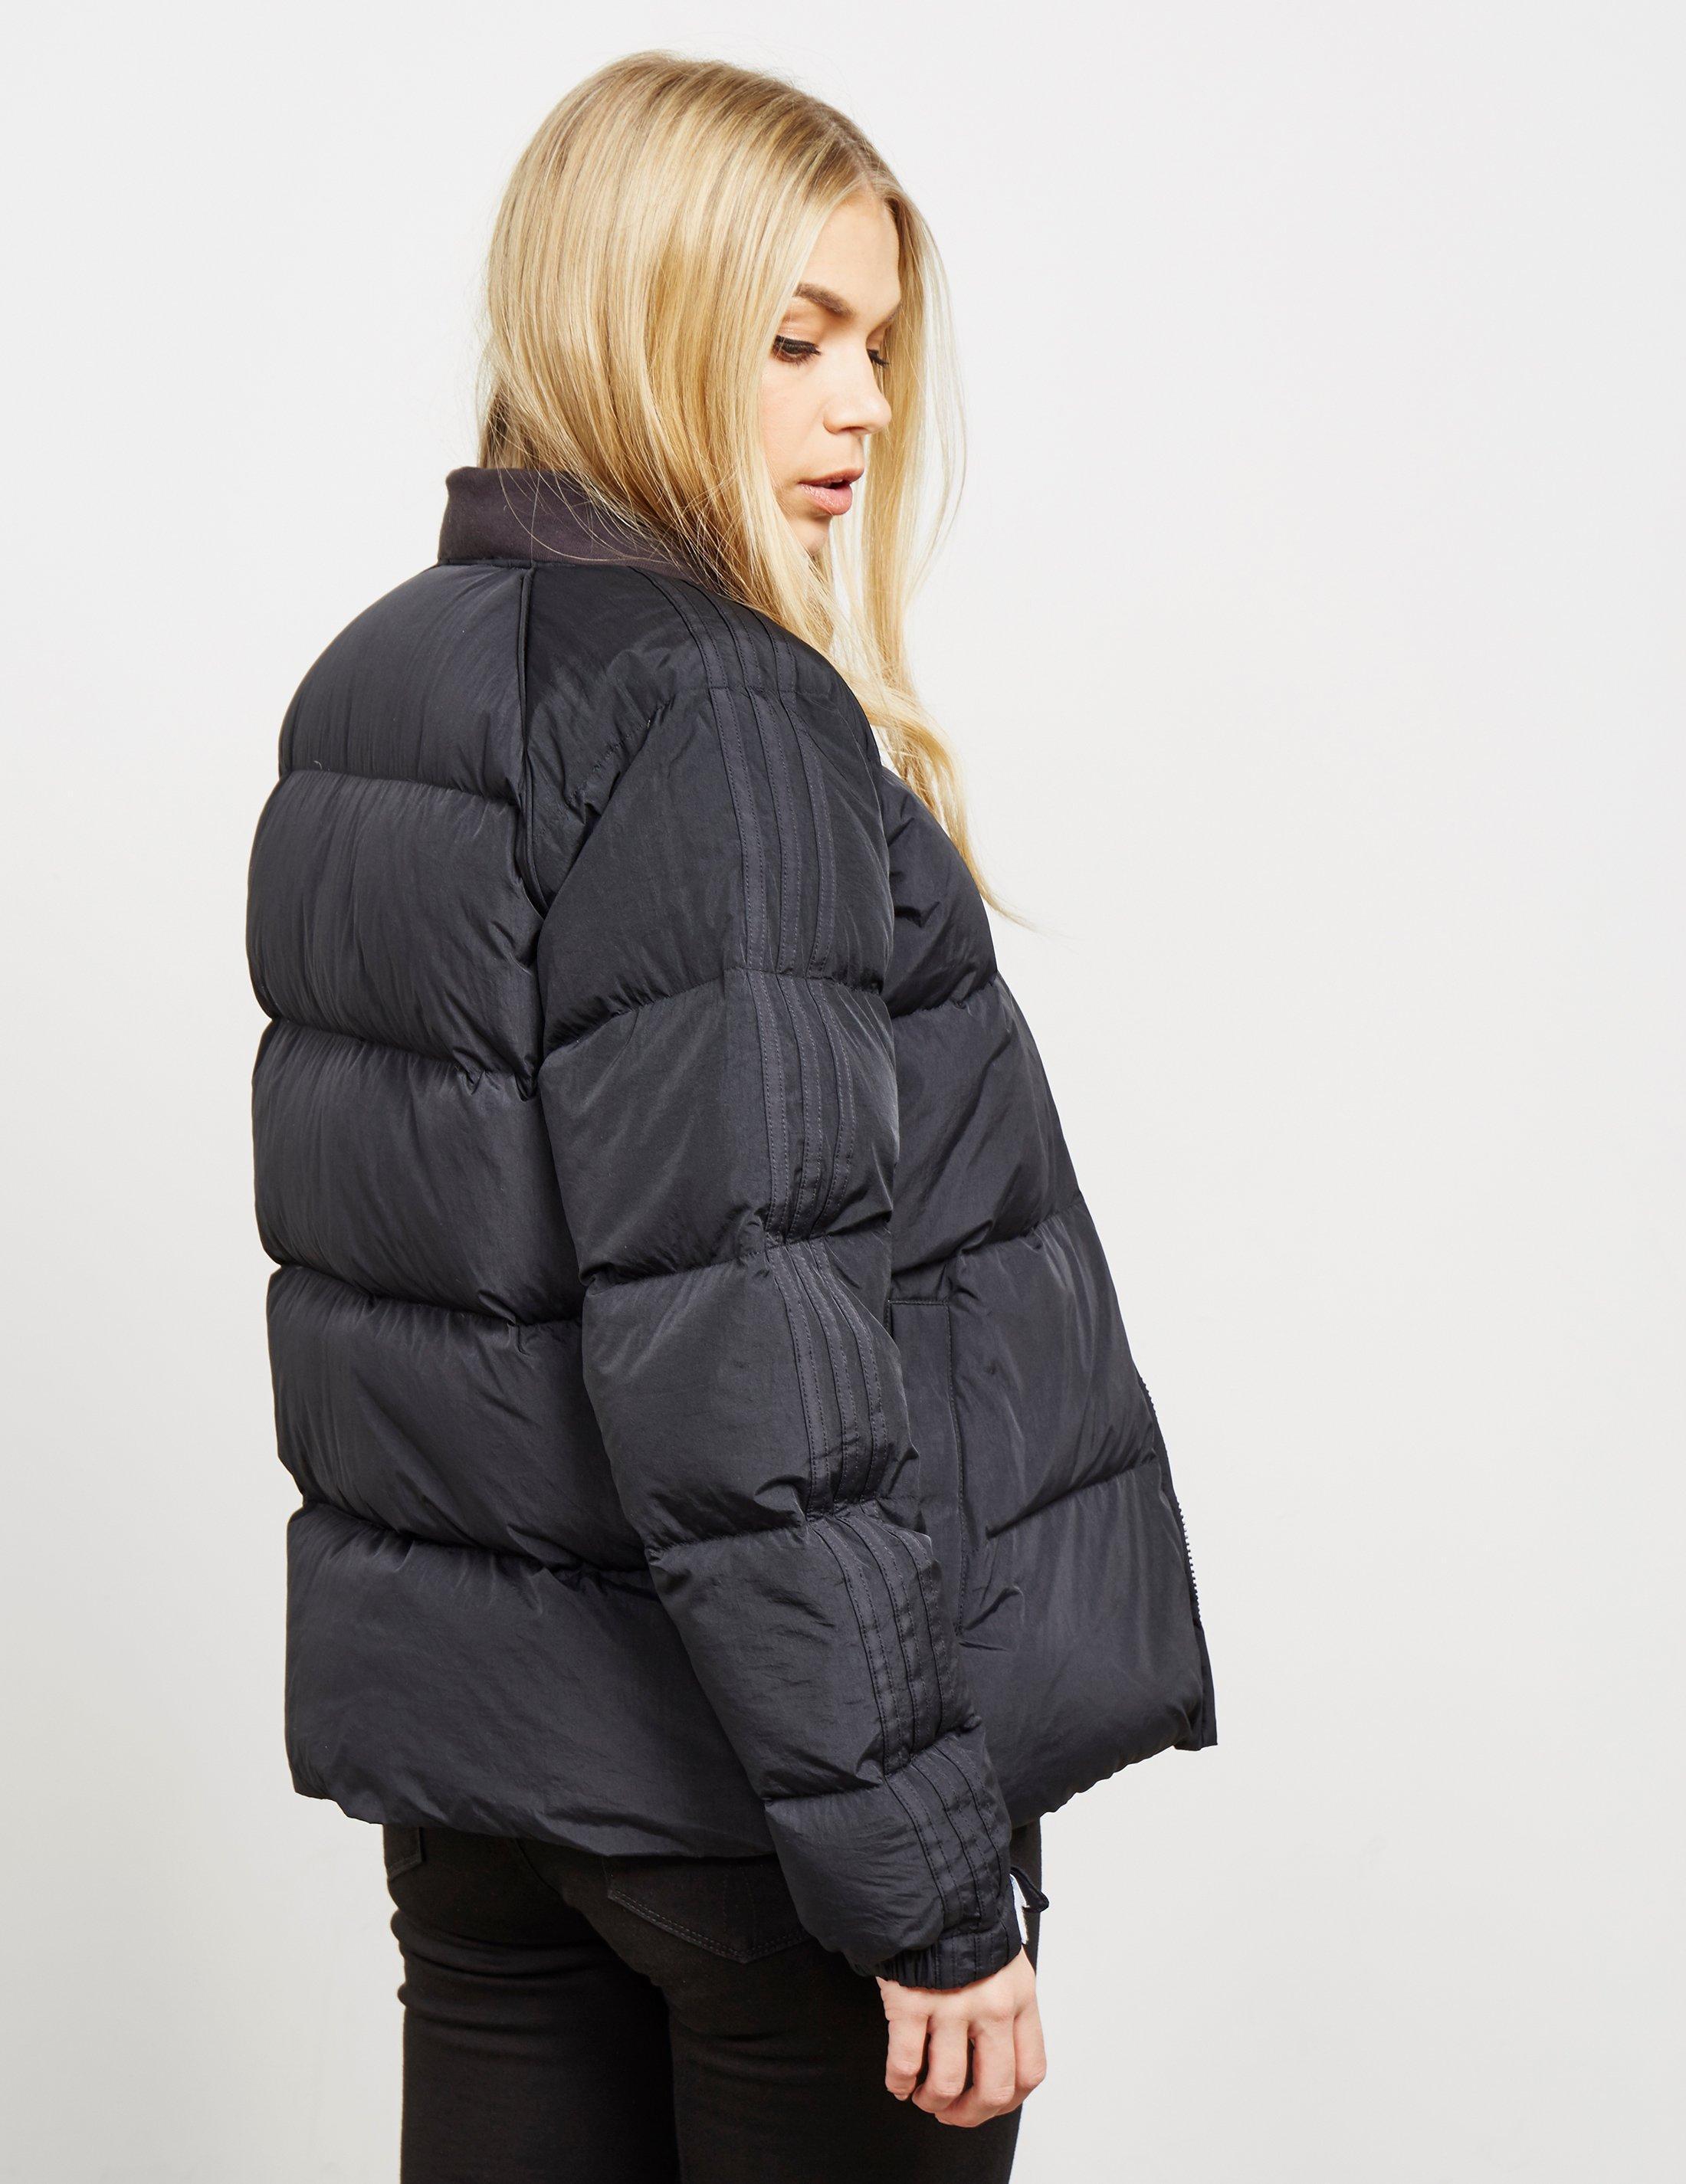 42cd83296 adidas Originals Womens Down Padded Jacket Black in Black - Lyst